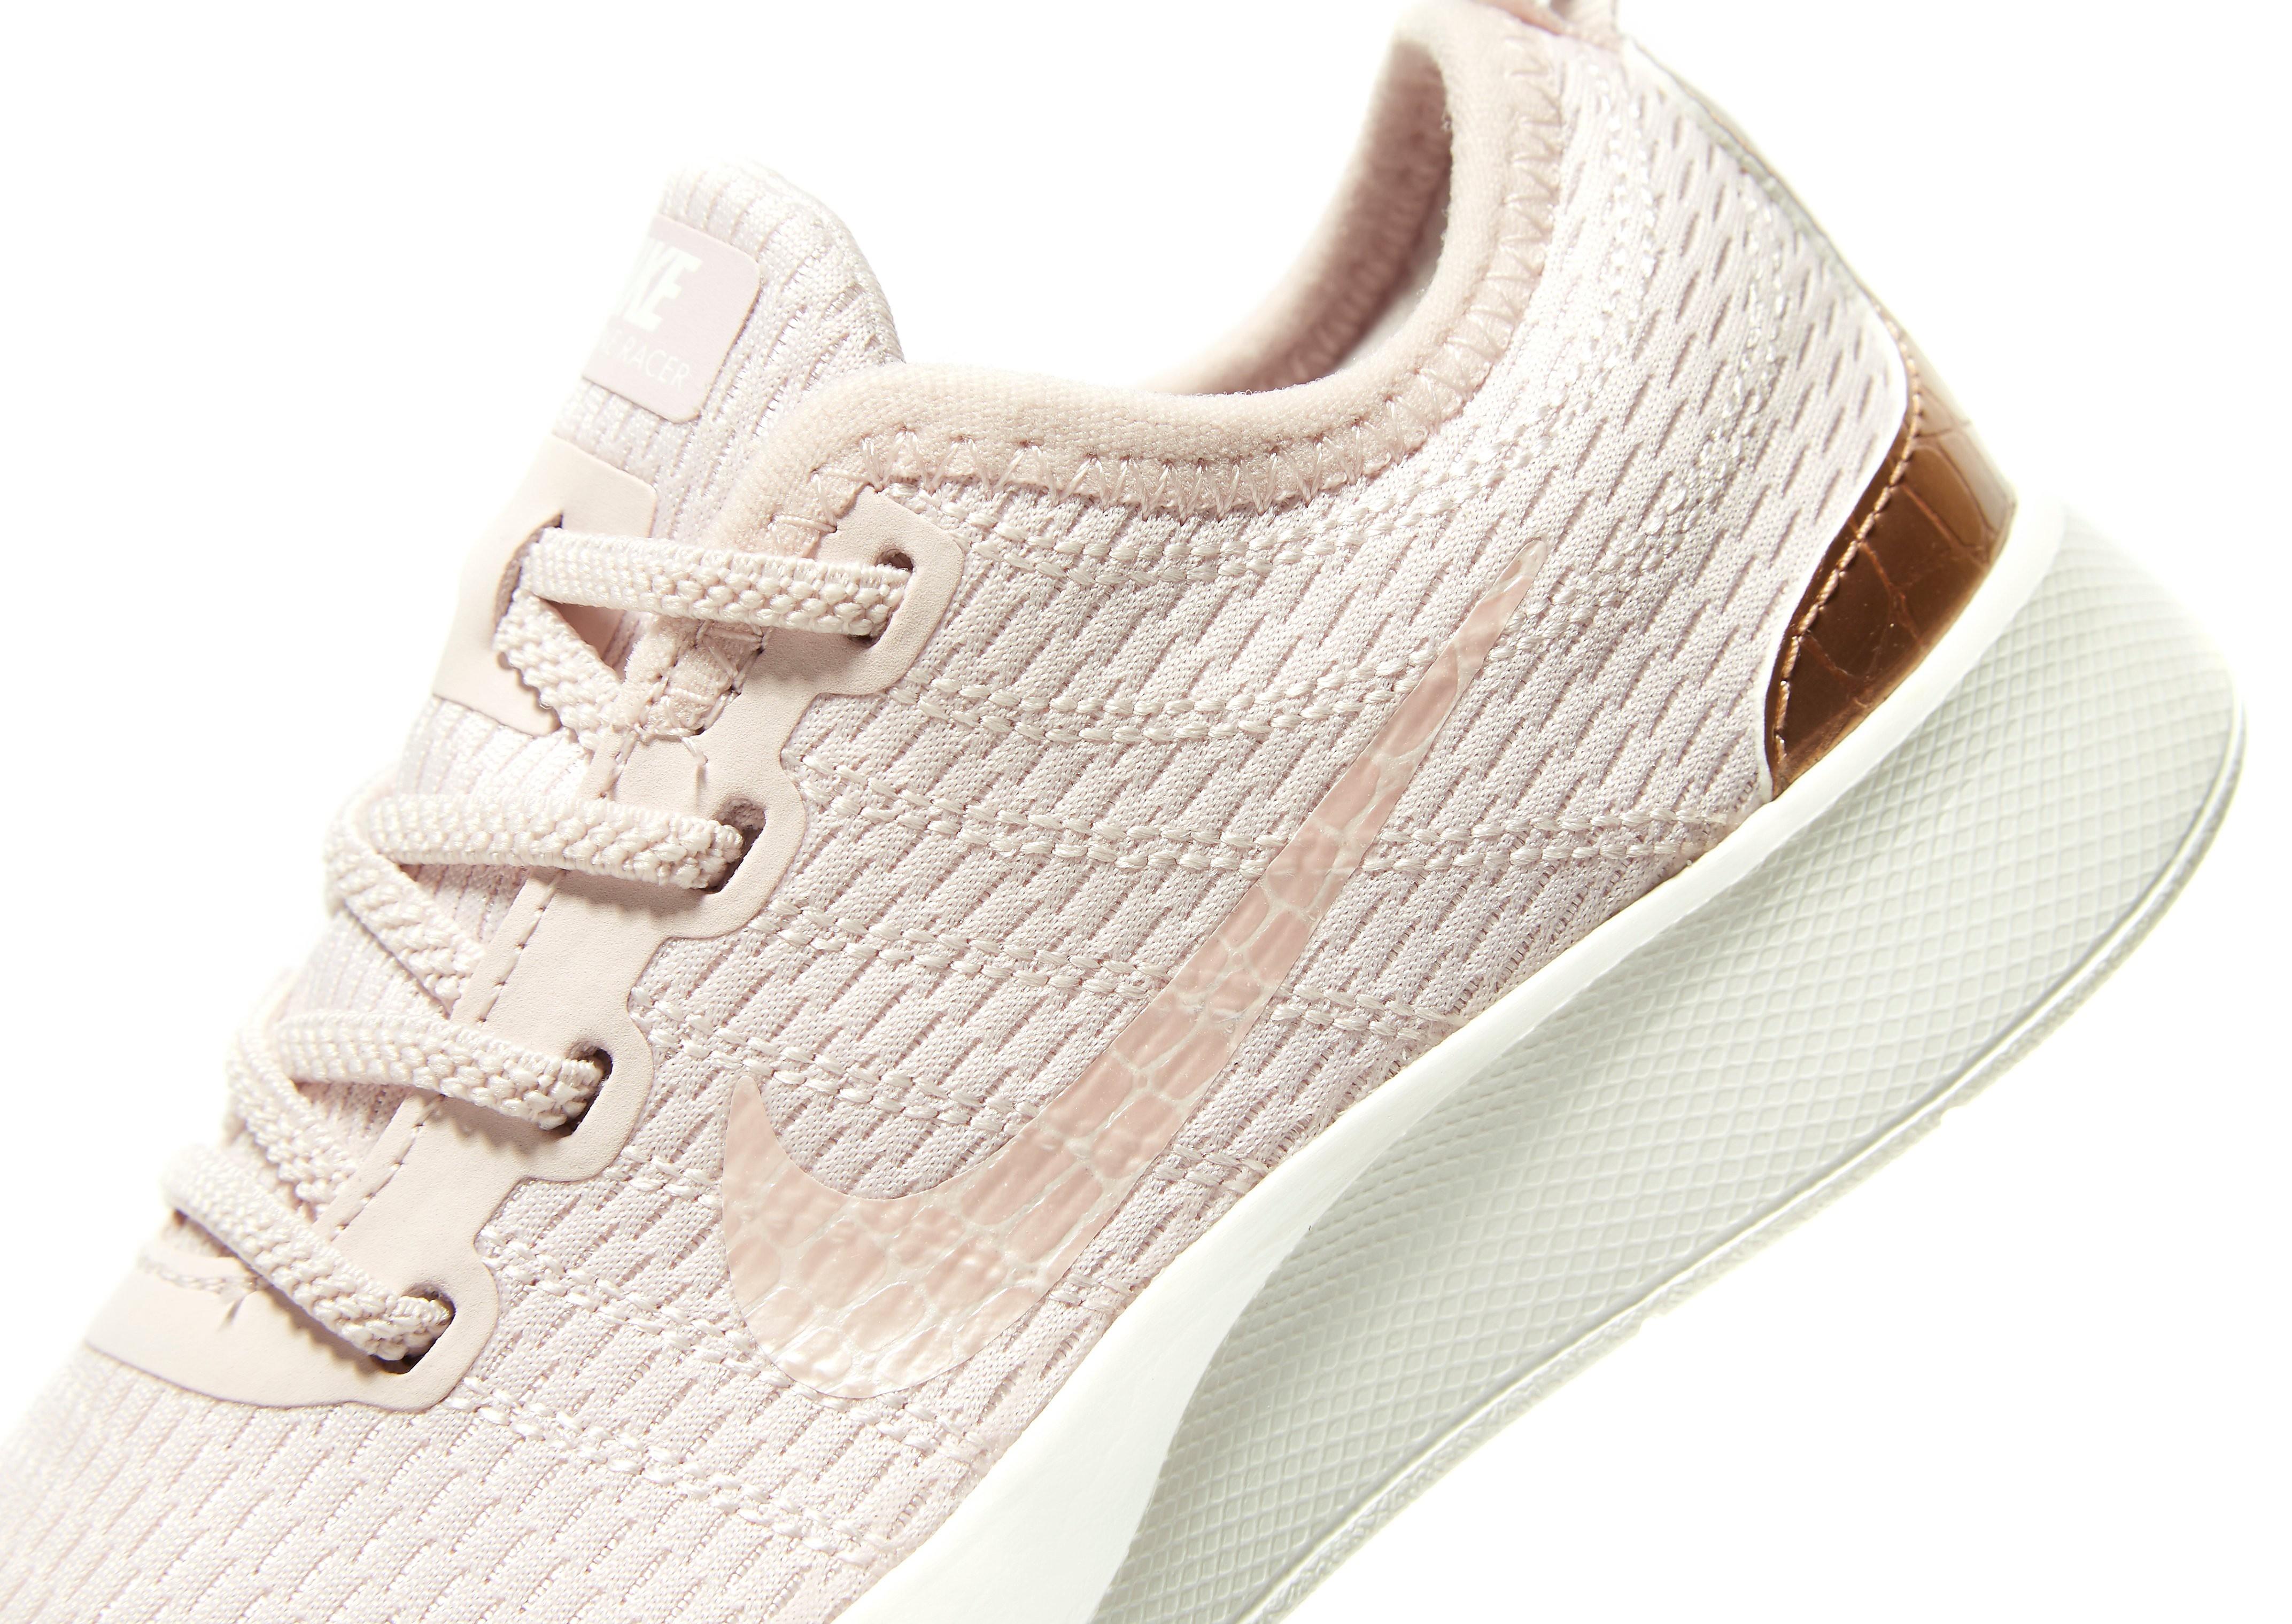 Nike Dualtone Racer Baby's